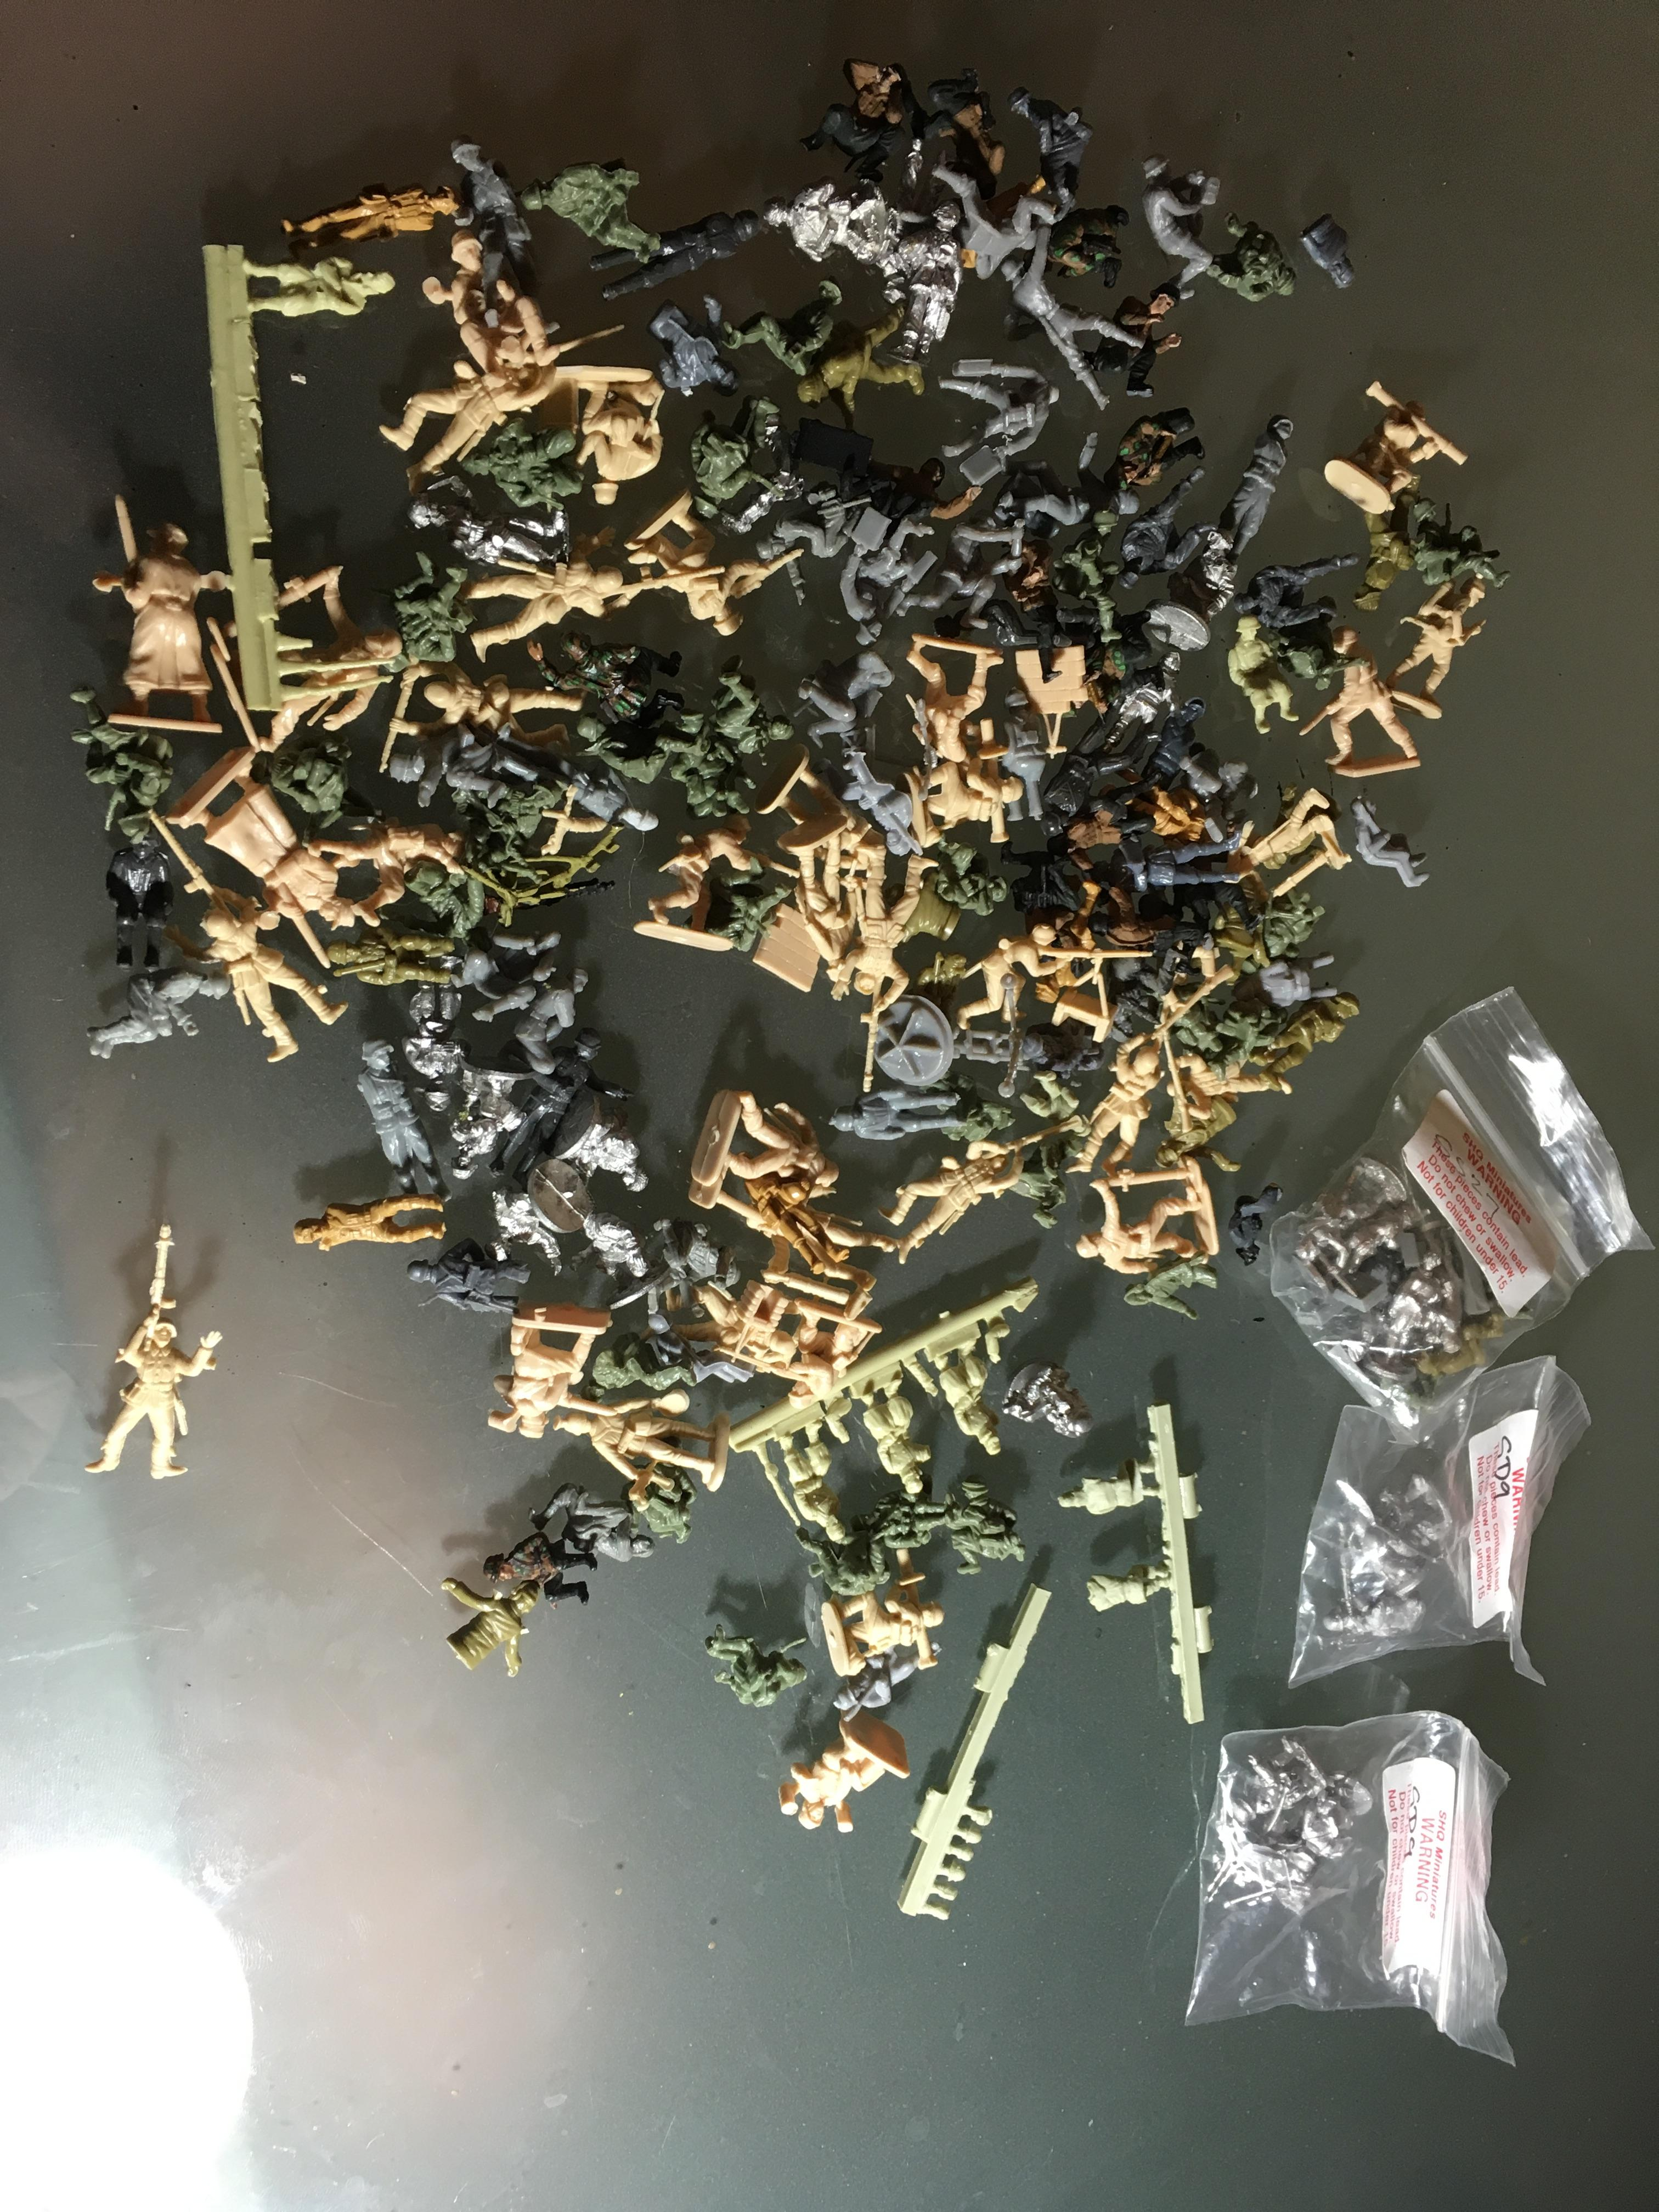 Soldier Bits